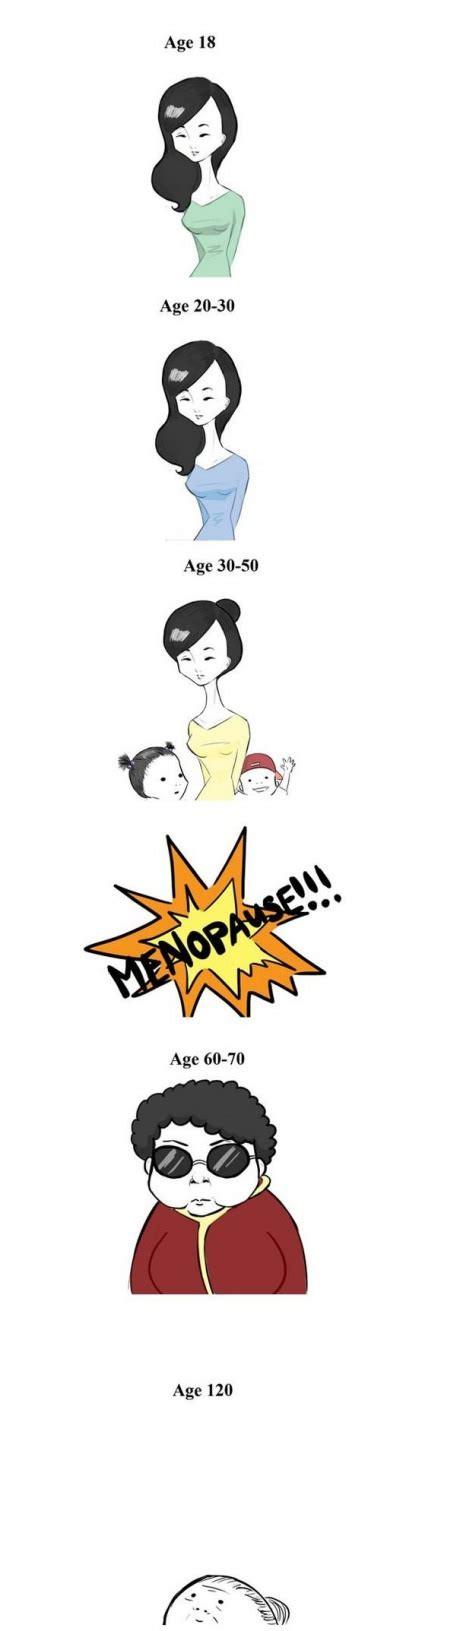 Asian Lady Aging Meme - asian girl aging meme www pixshark com images